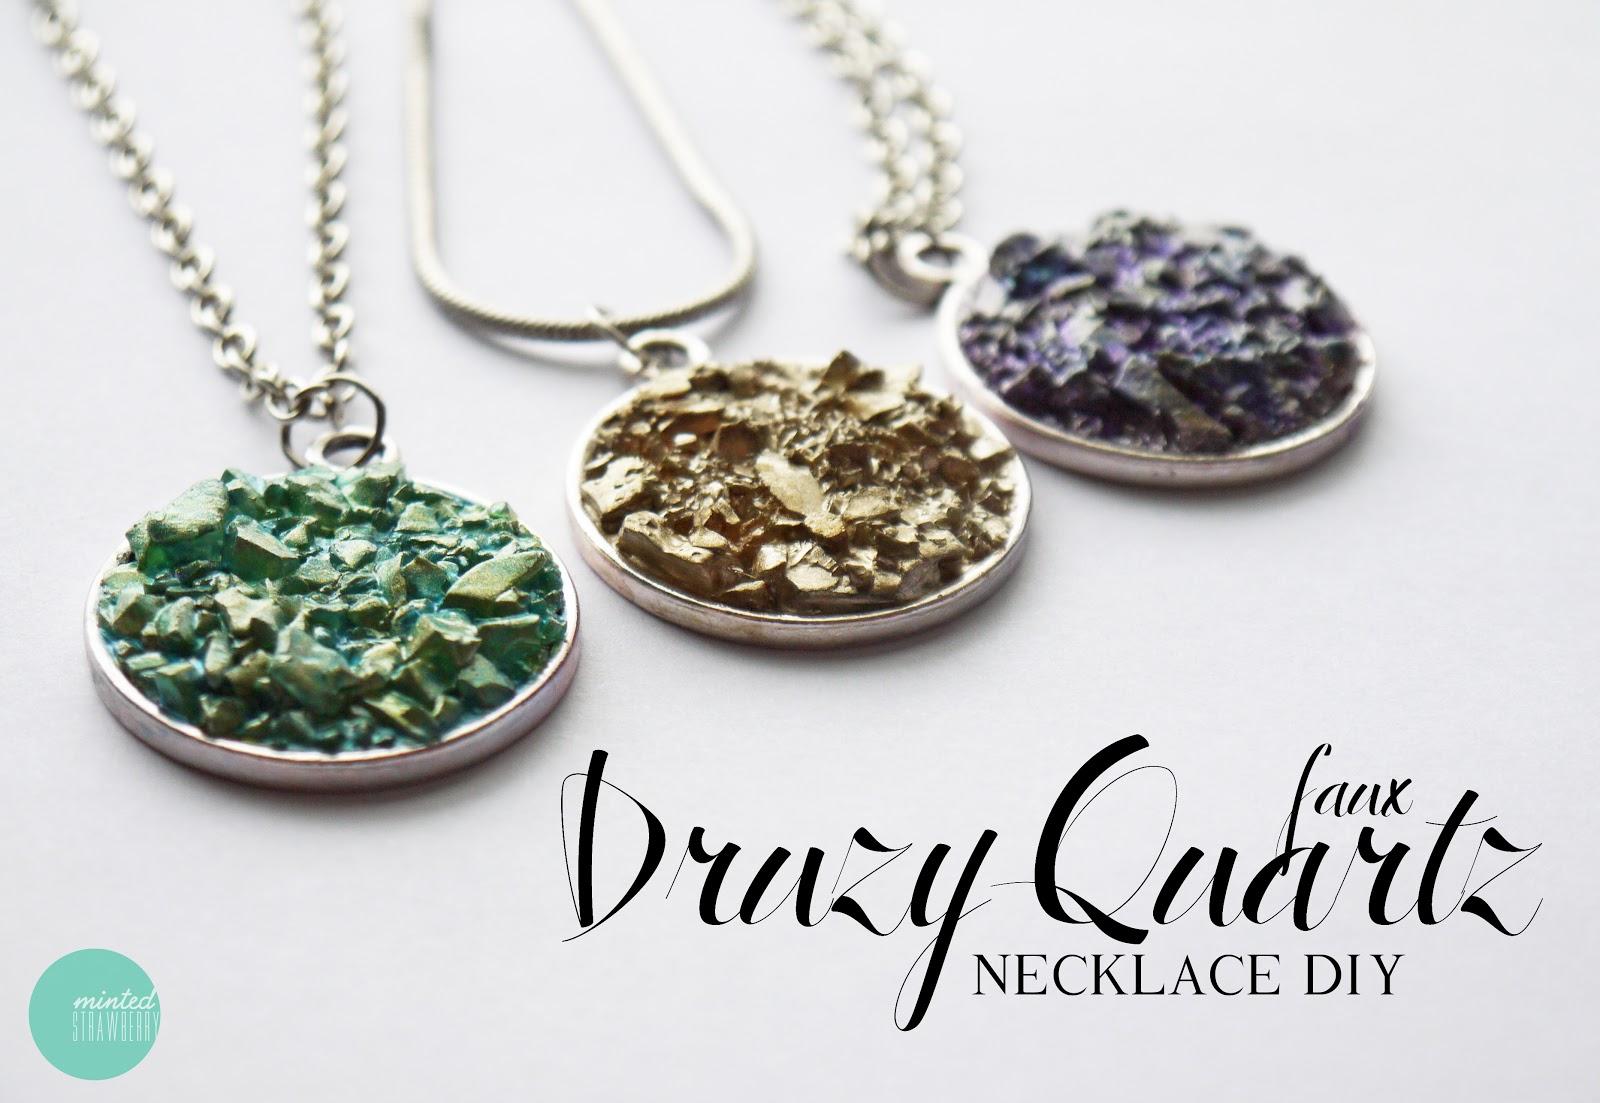 diy necklace pendant - photo #37